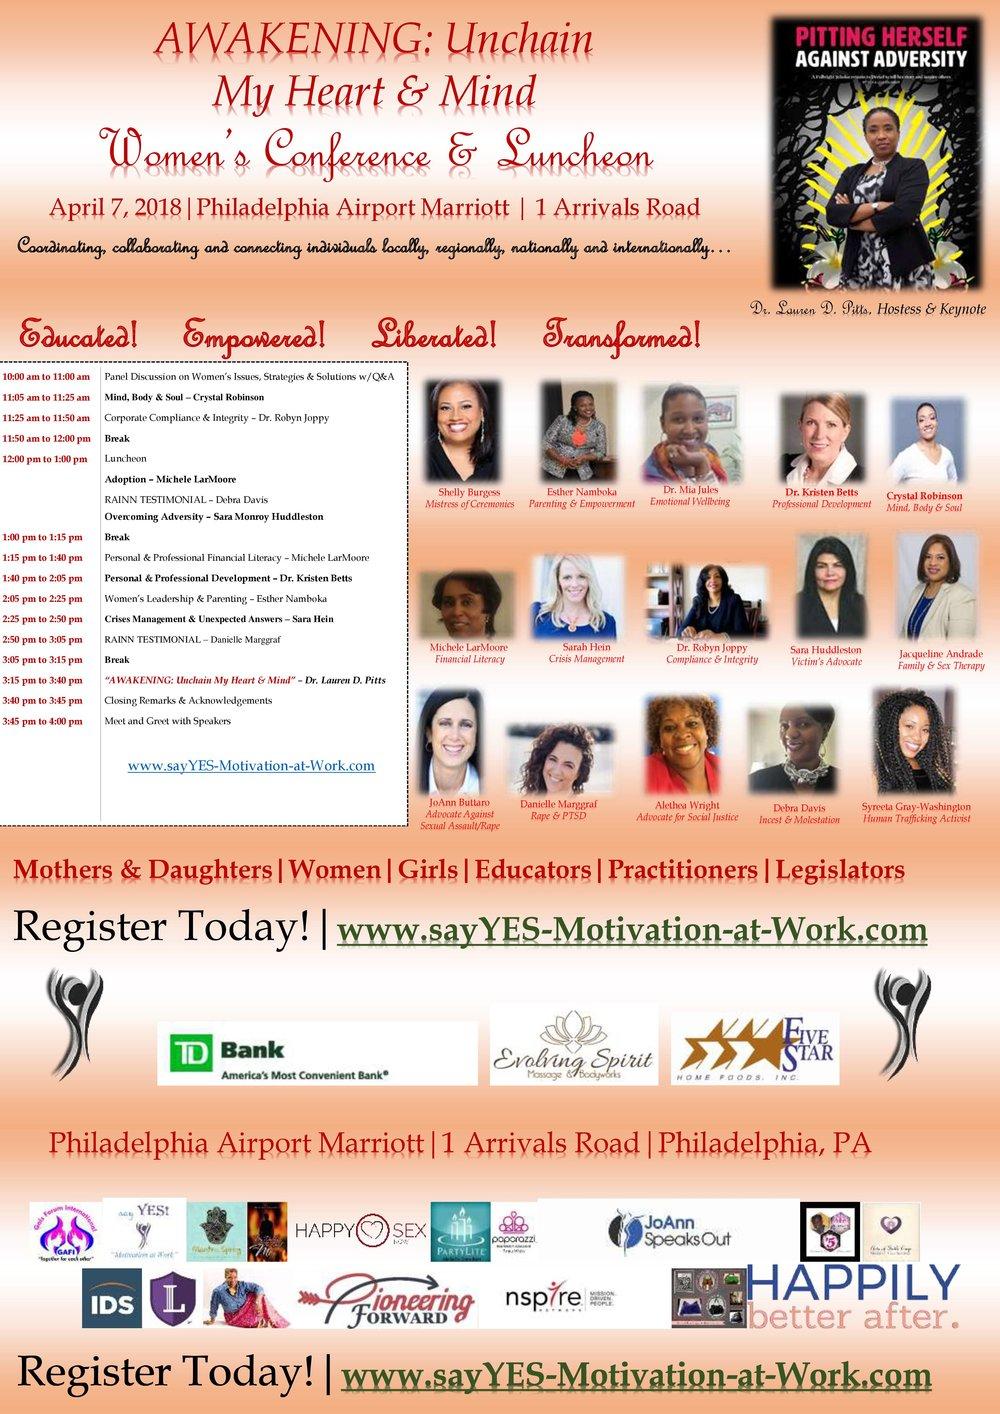 Women's Conference 2018 flyer 8.jpg